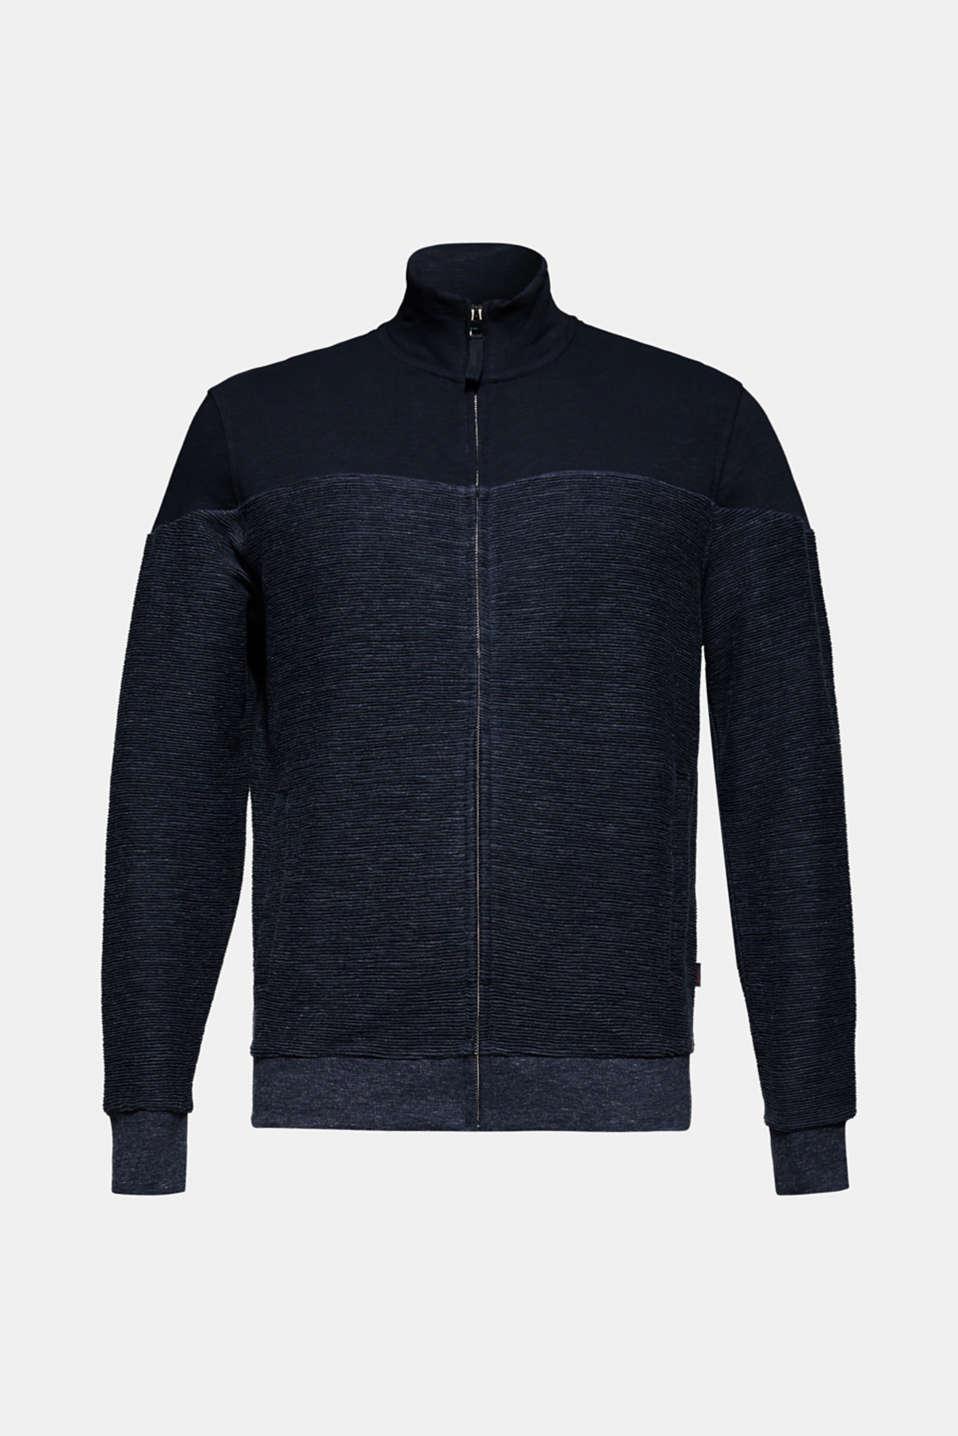 Sweatshirt cardigan with organic cotton, NAVY, detail image number 7